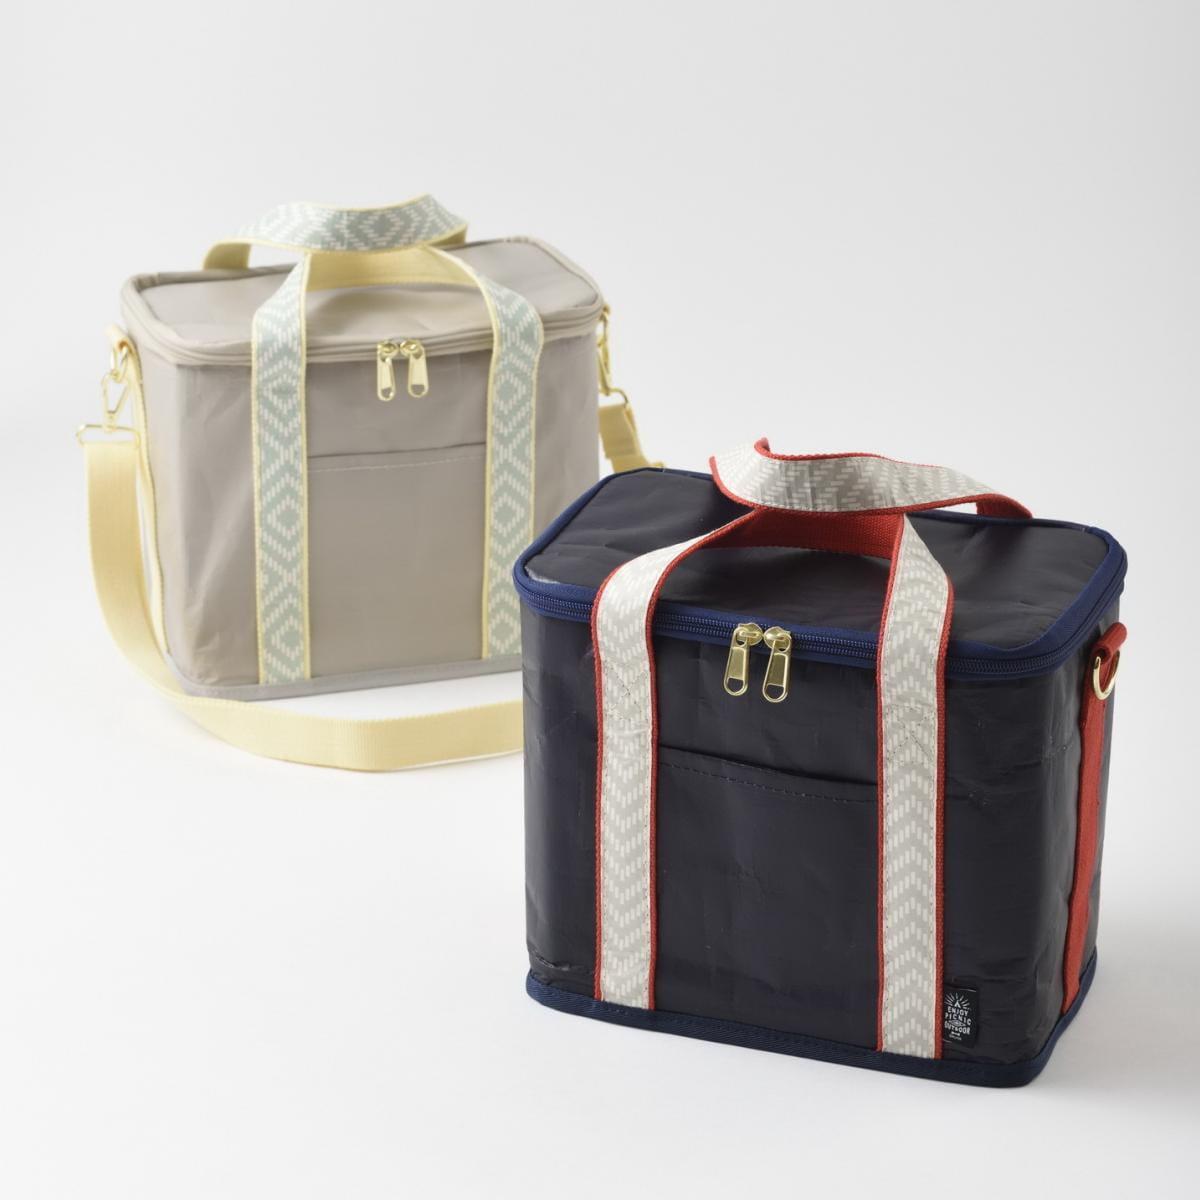 【BRUNO】 野趣保溫保冷小型午餐袋(共2色)BHK153